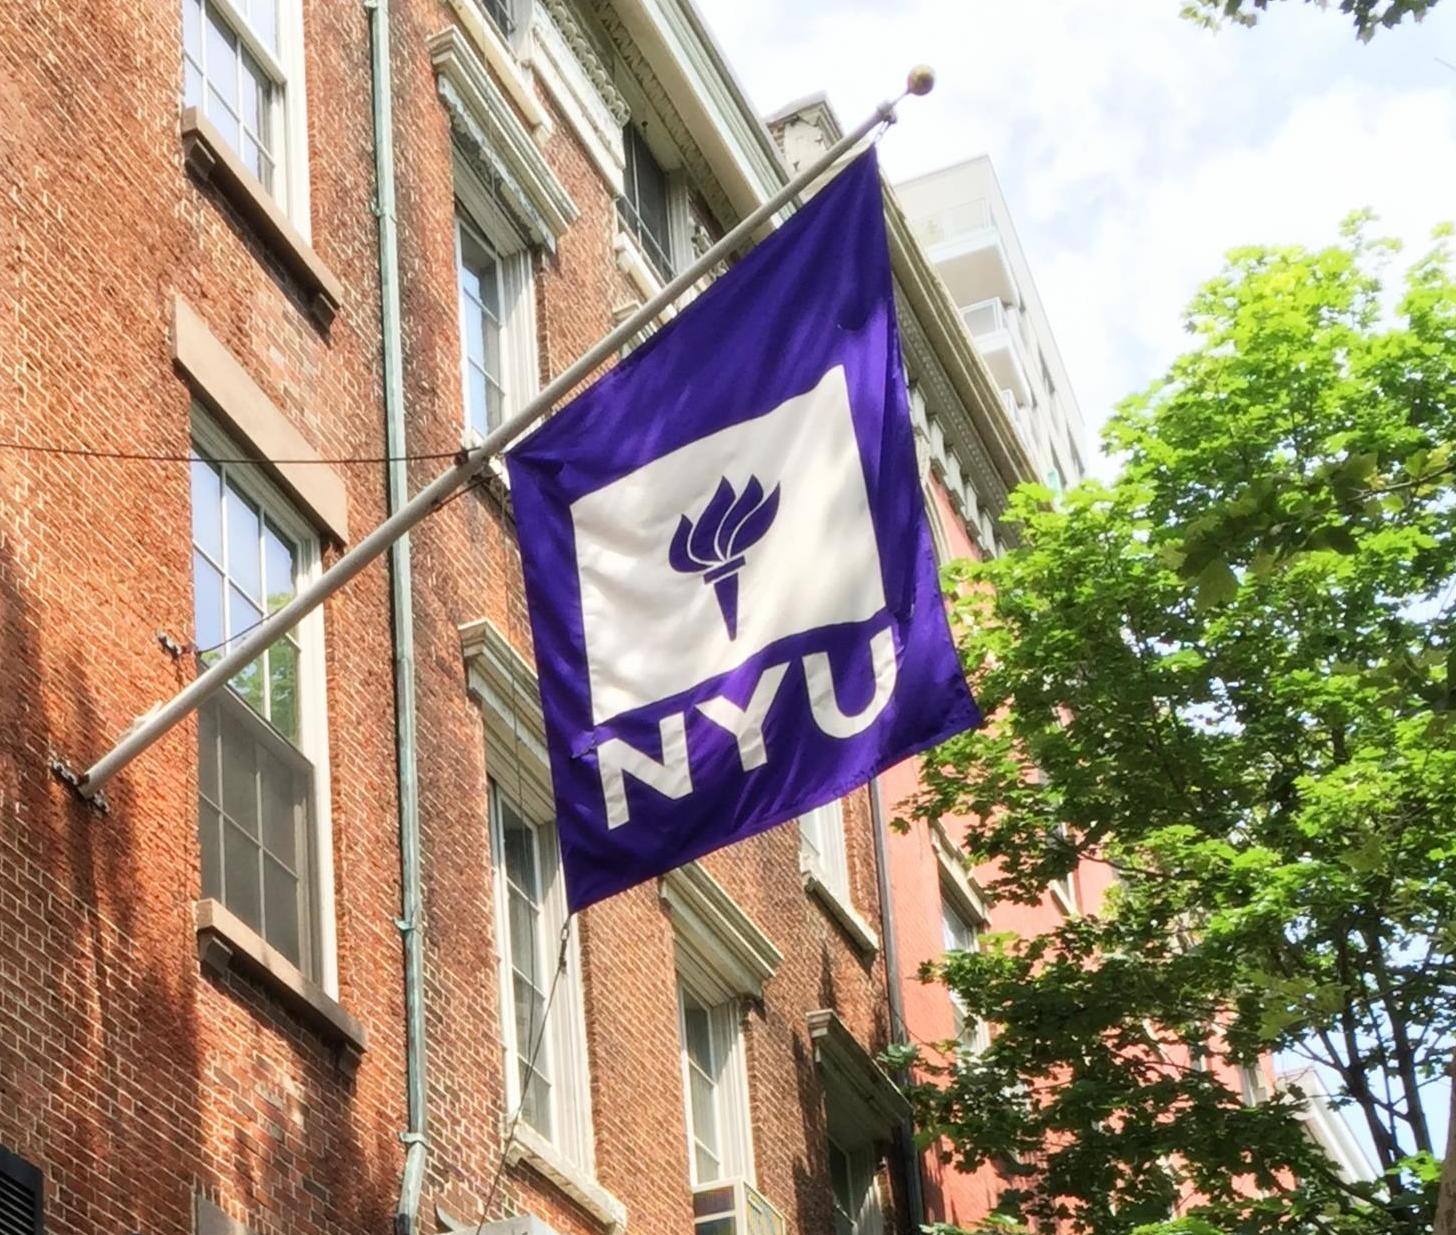 nyu law flag cropped